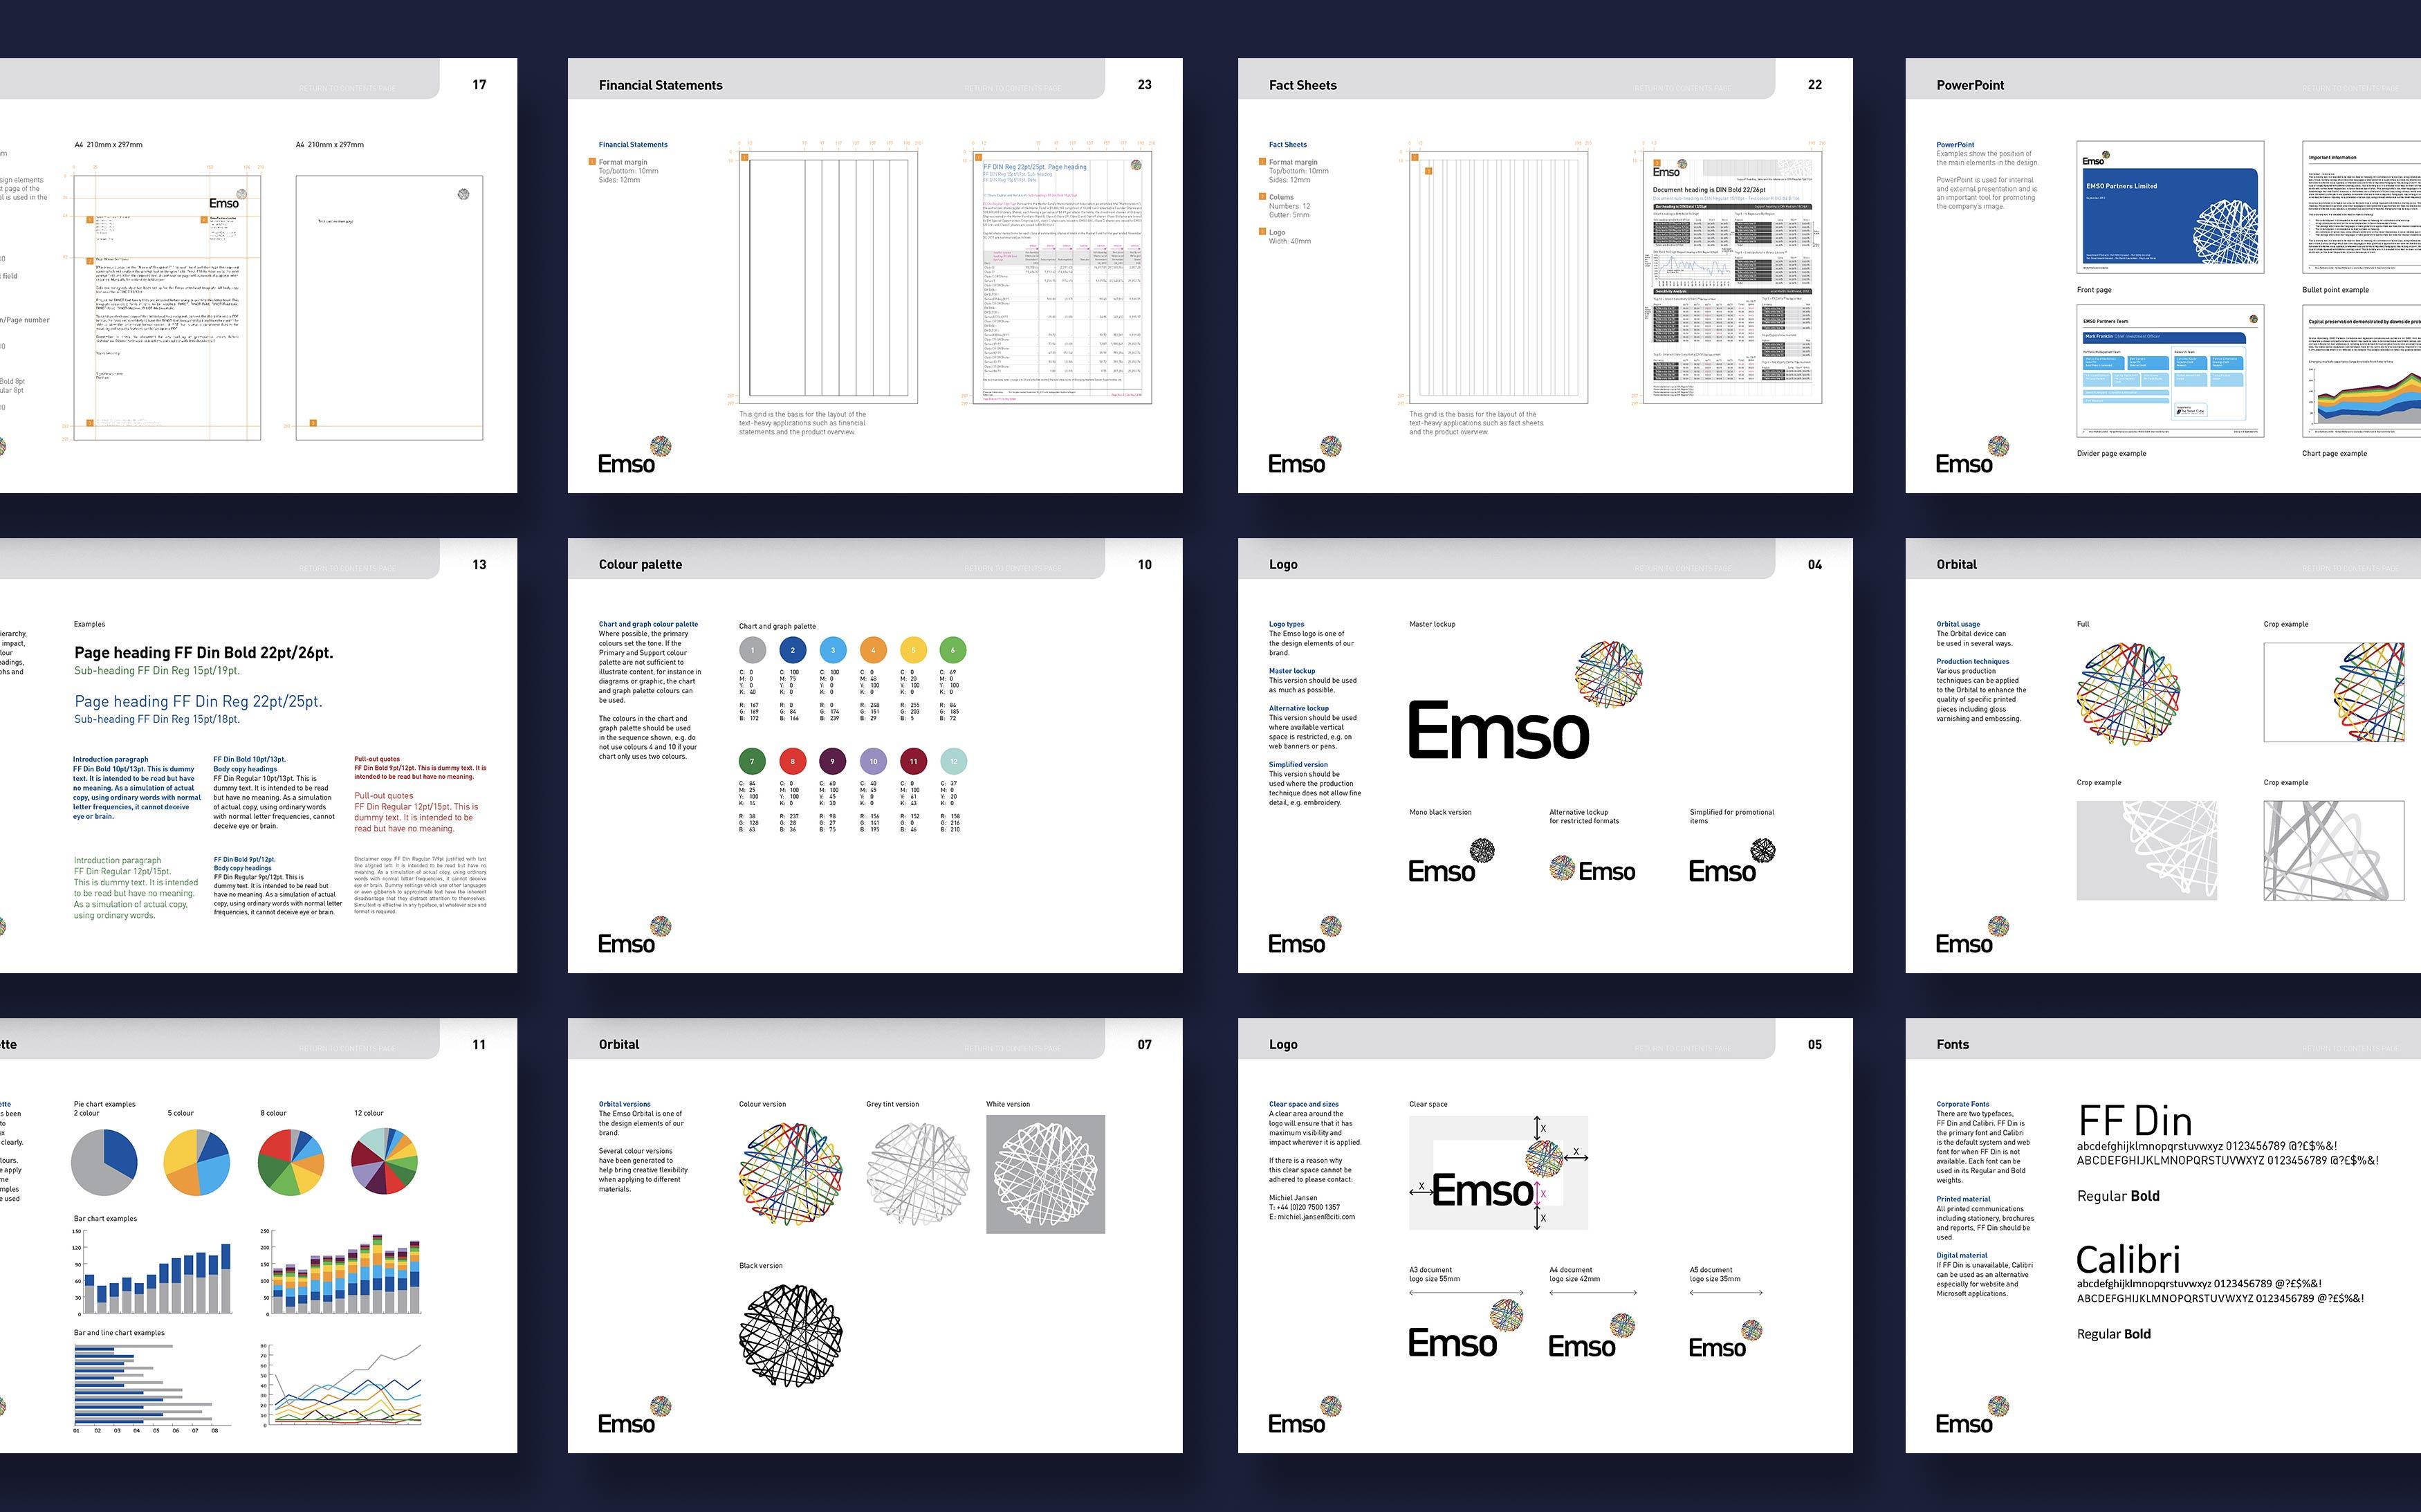 04 EMSO FIN CASE STUDY